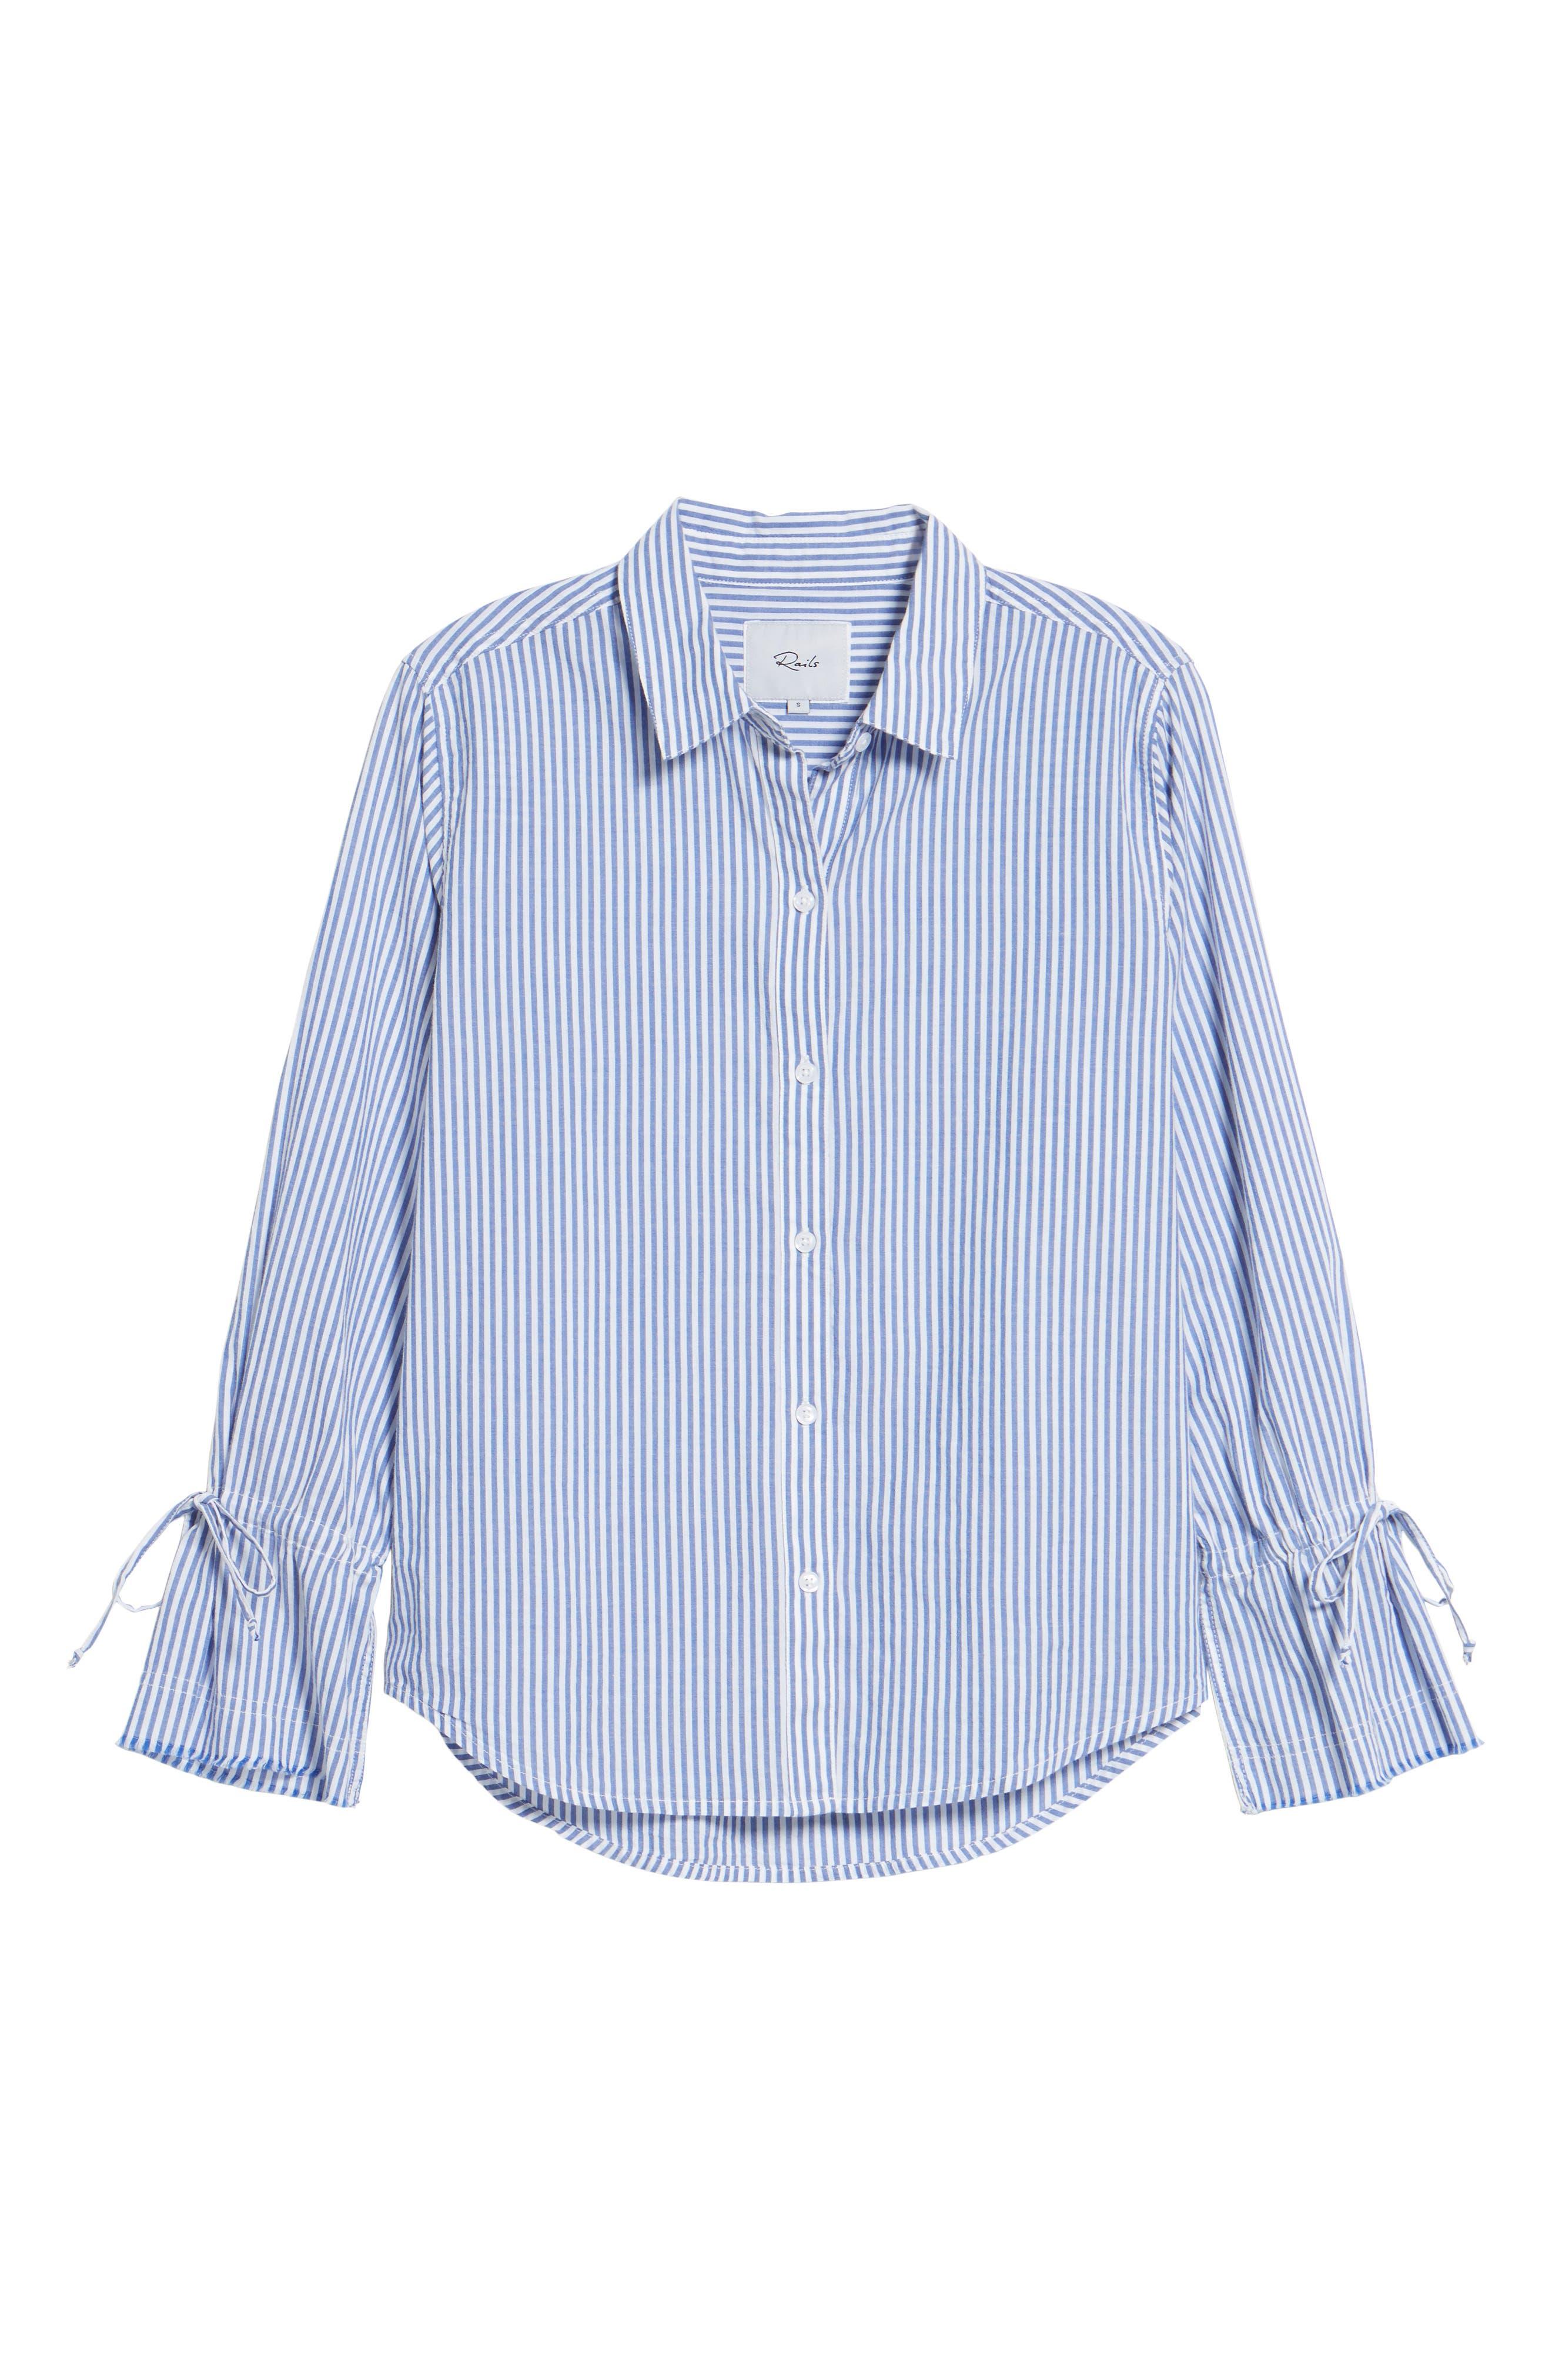 Astrid Tie Cuff Shirt,                             Alternate thumbnail 6, color,                             402